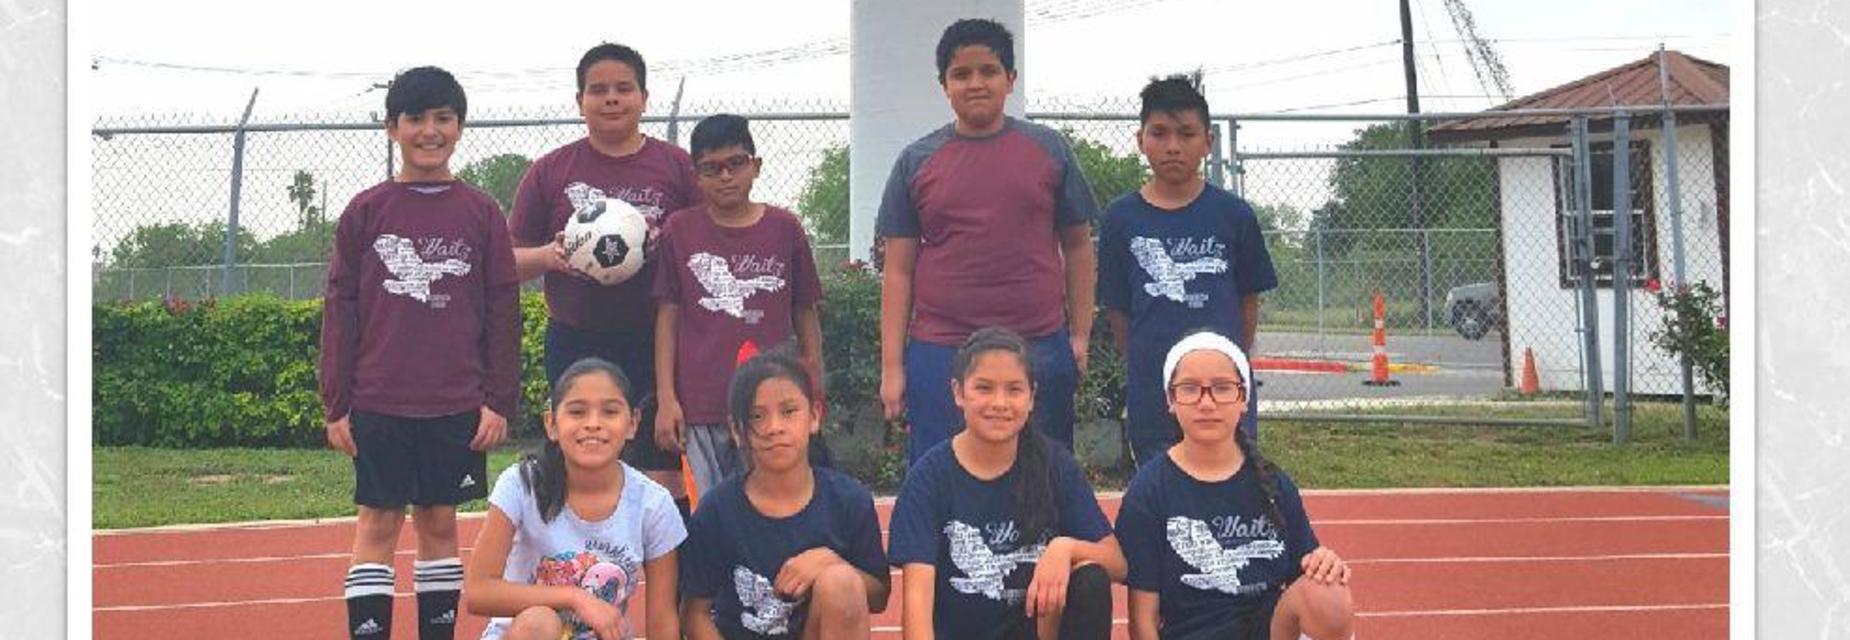 Soccer kids at Tom Landry stadium